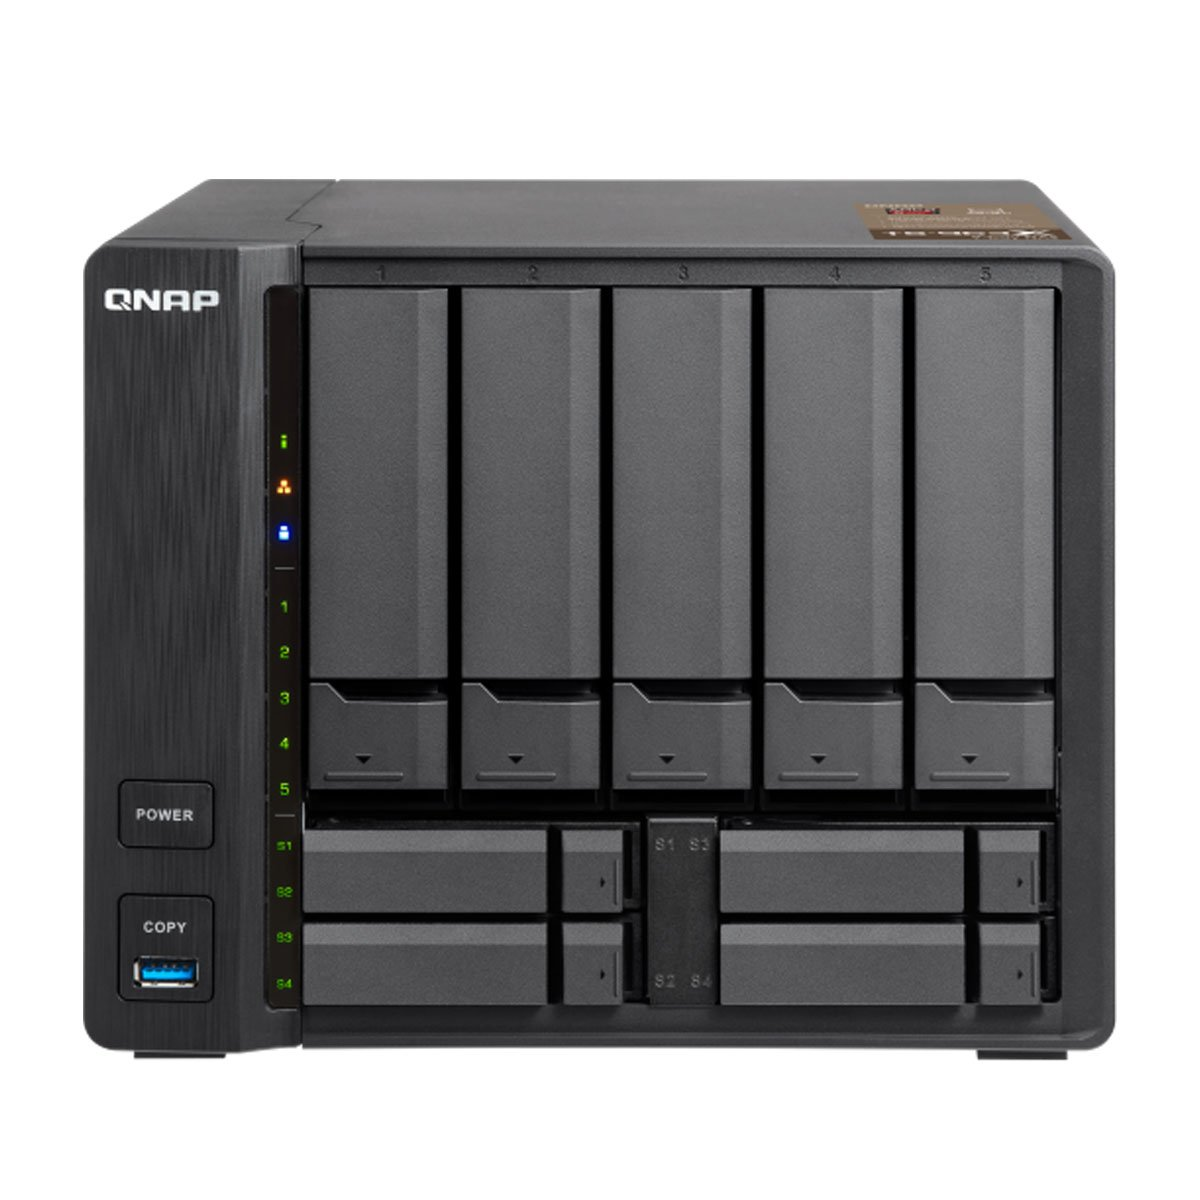 QNAP TS-963X-8G-US 5 (+4) Bay 10G AMD 64Bit X86-Based NAS, Quad Core  2 0GHz, 8GB RAM, 1 X 1GbE, 1 X 10GbE (10Gbase-T)